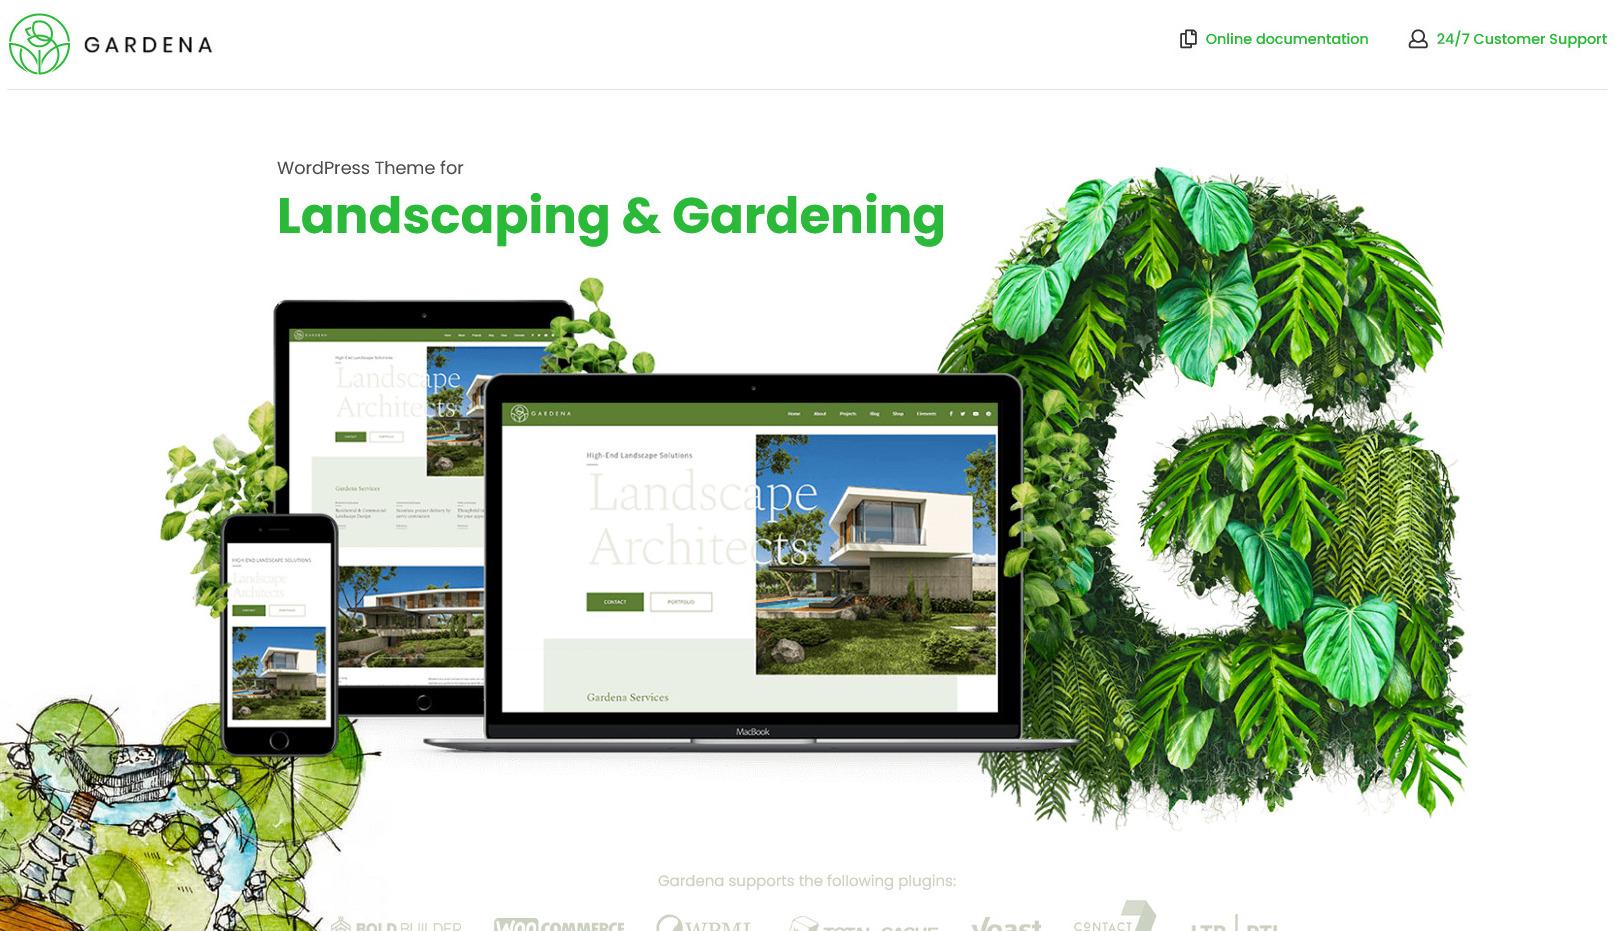 Gardena – WordPress Theme for Gardening and Landscaping